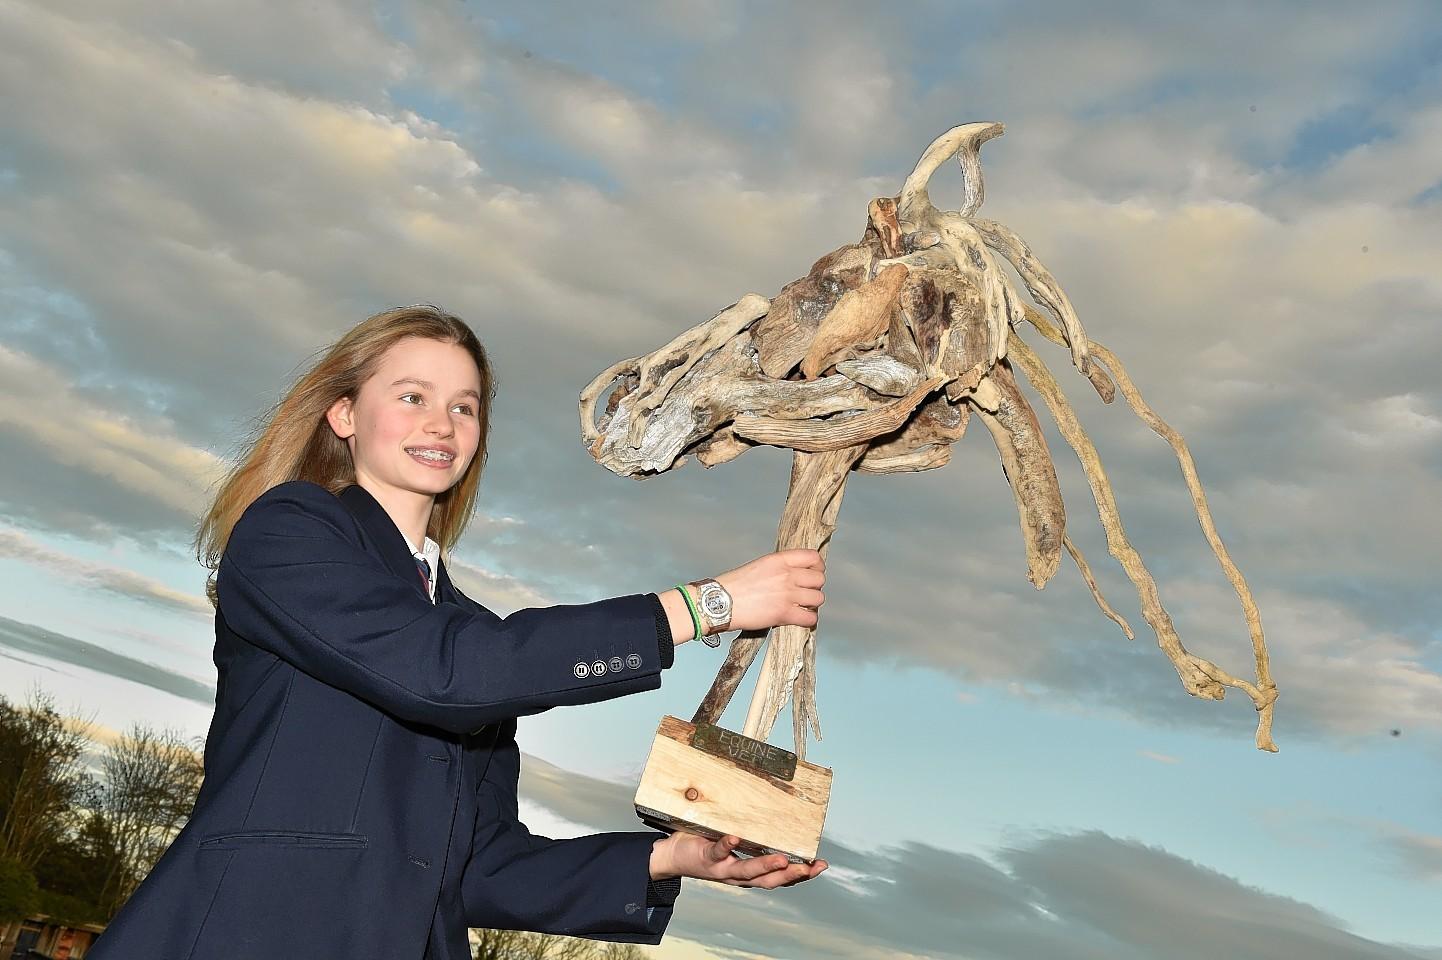 Millie Wark, 13, with her prize-winning sculpture